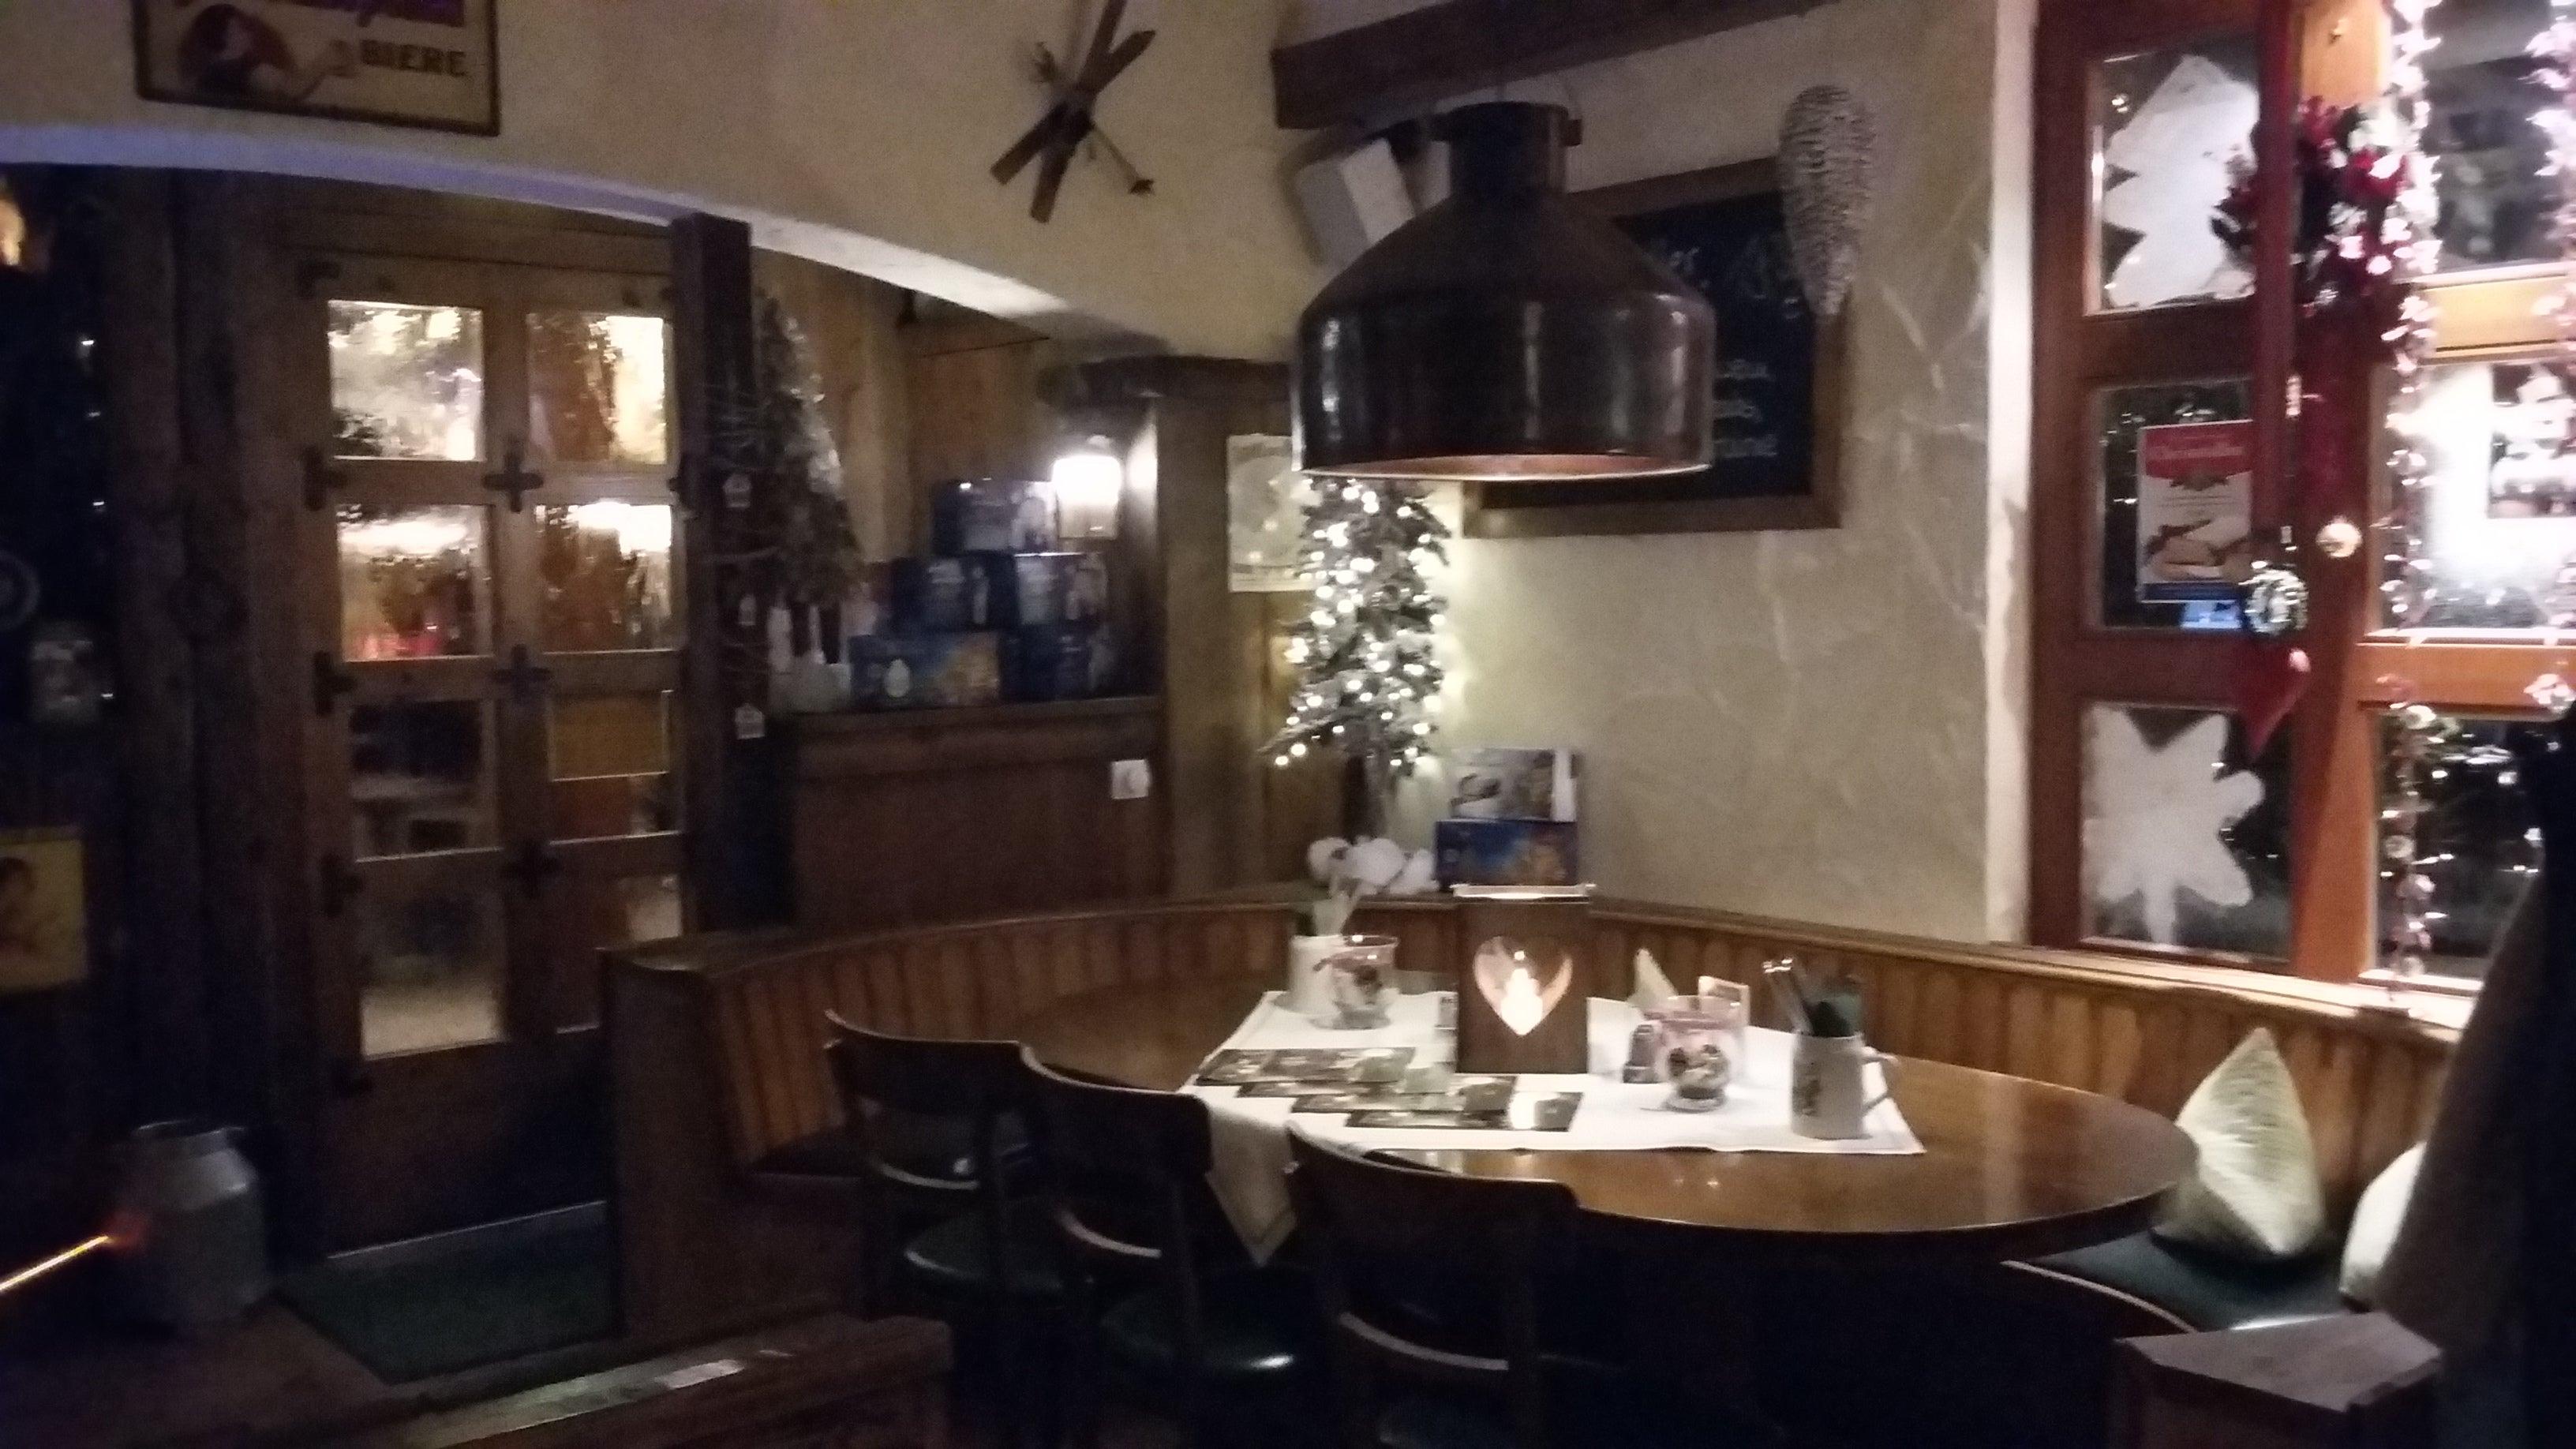 Kutscherschänke in Dresden – speisekarte.de